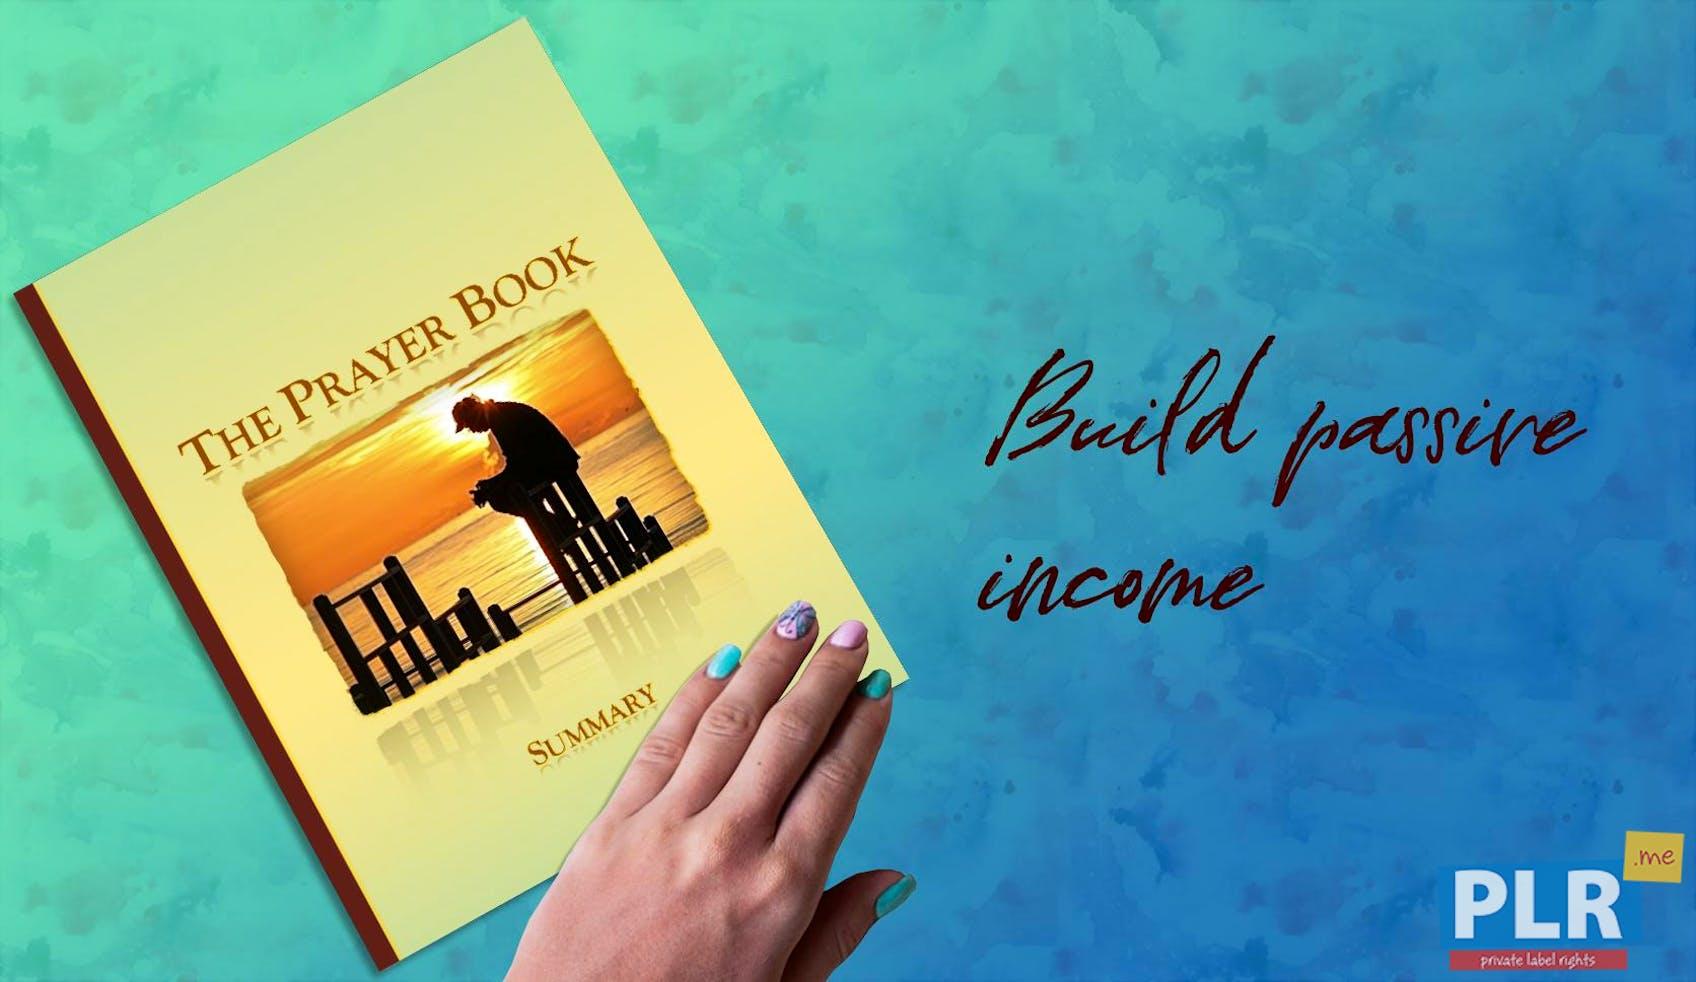 The Prayer Book Summary